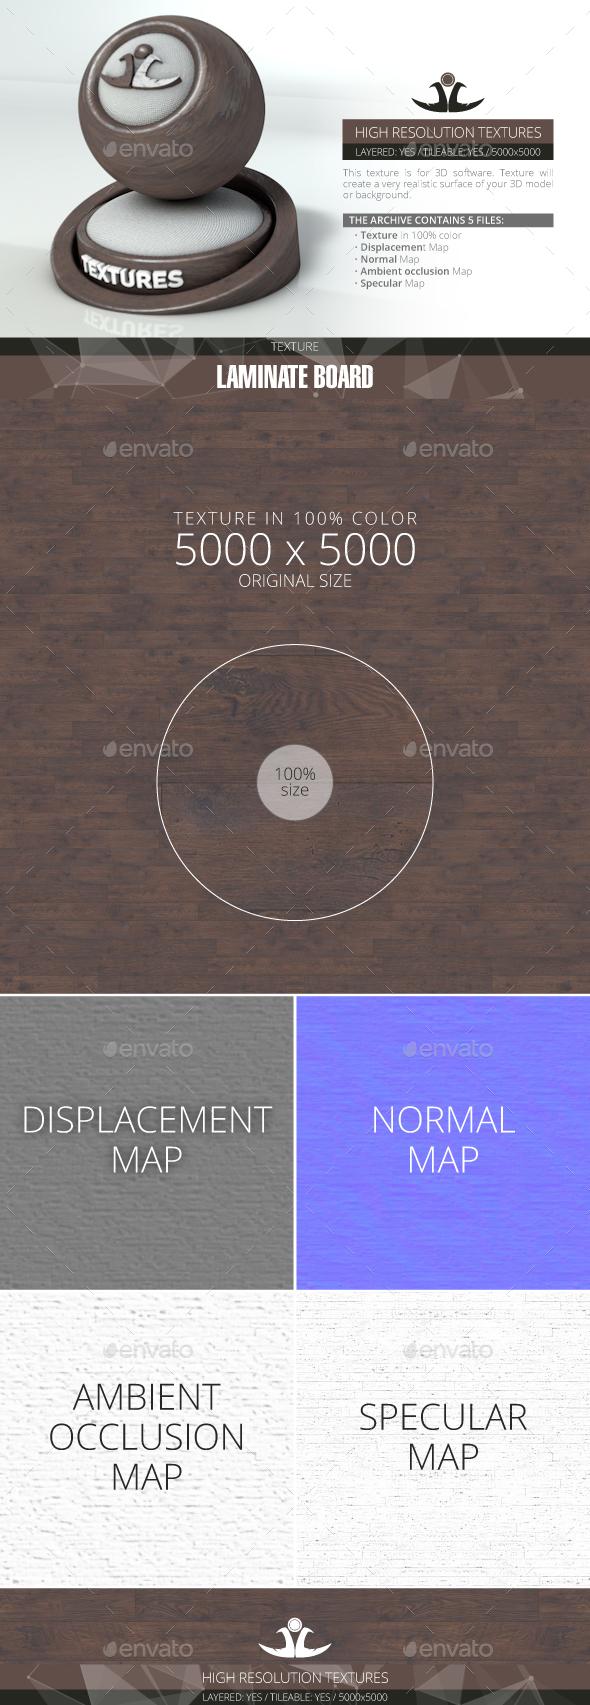 Laminate Board 61 - 3DOcean Item for Sale